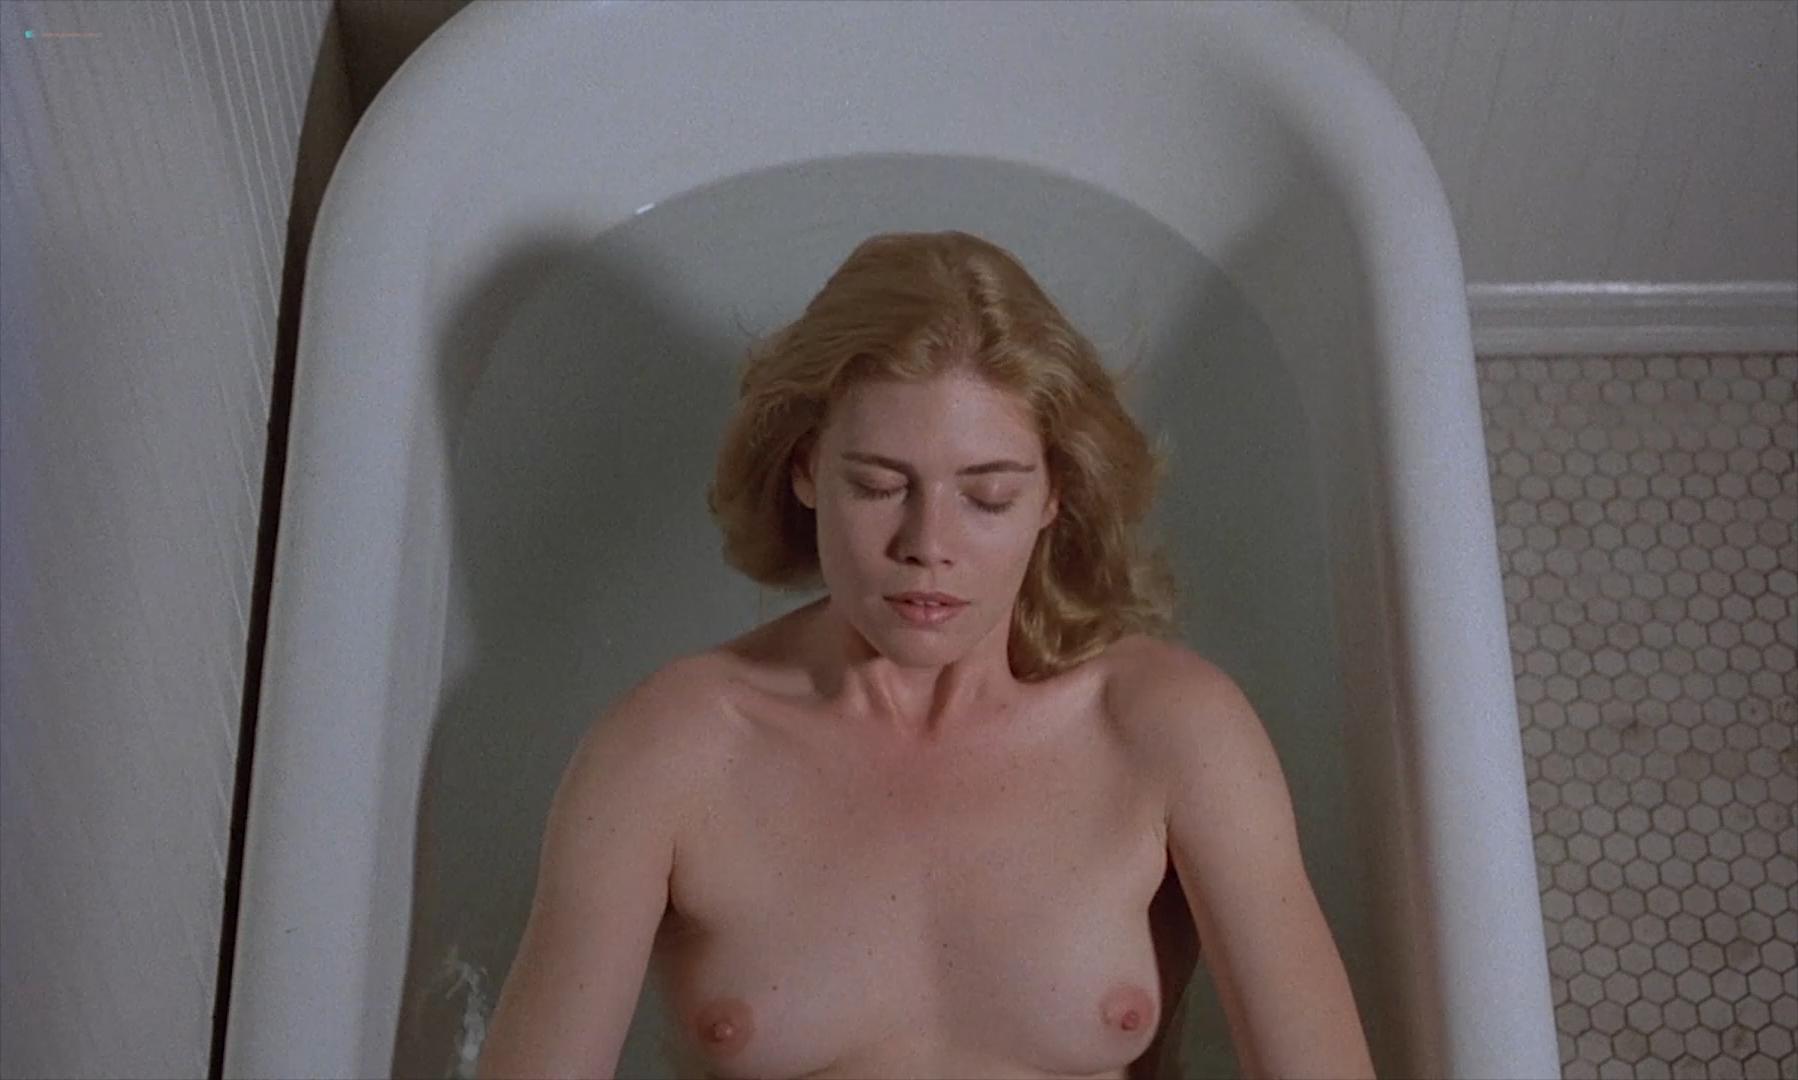 Kelly McGillis nude - The House on Carroll Street (1988)